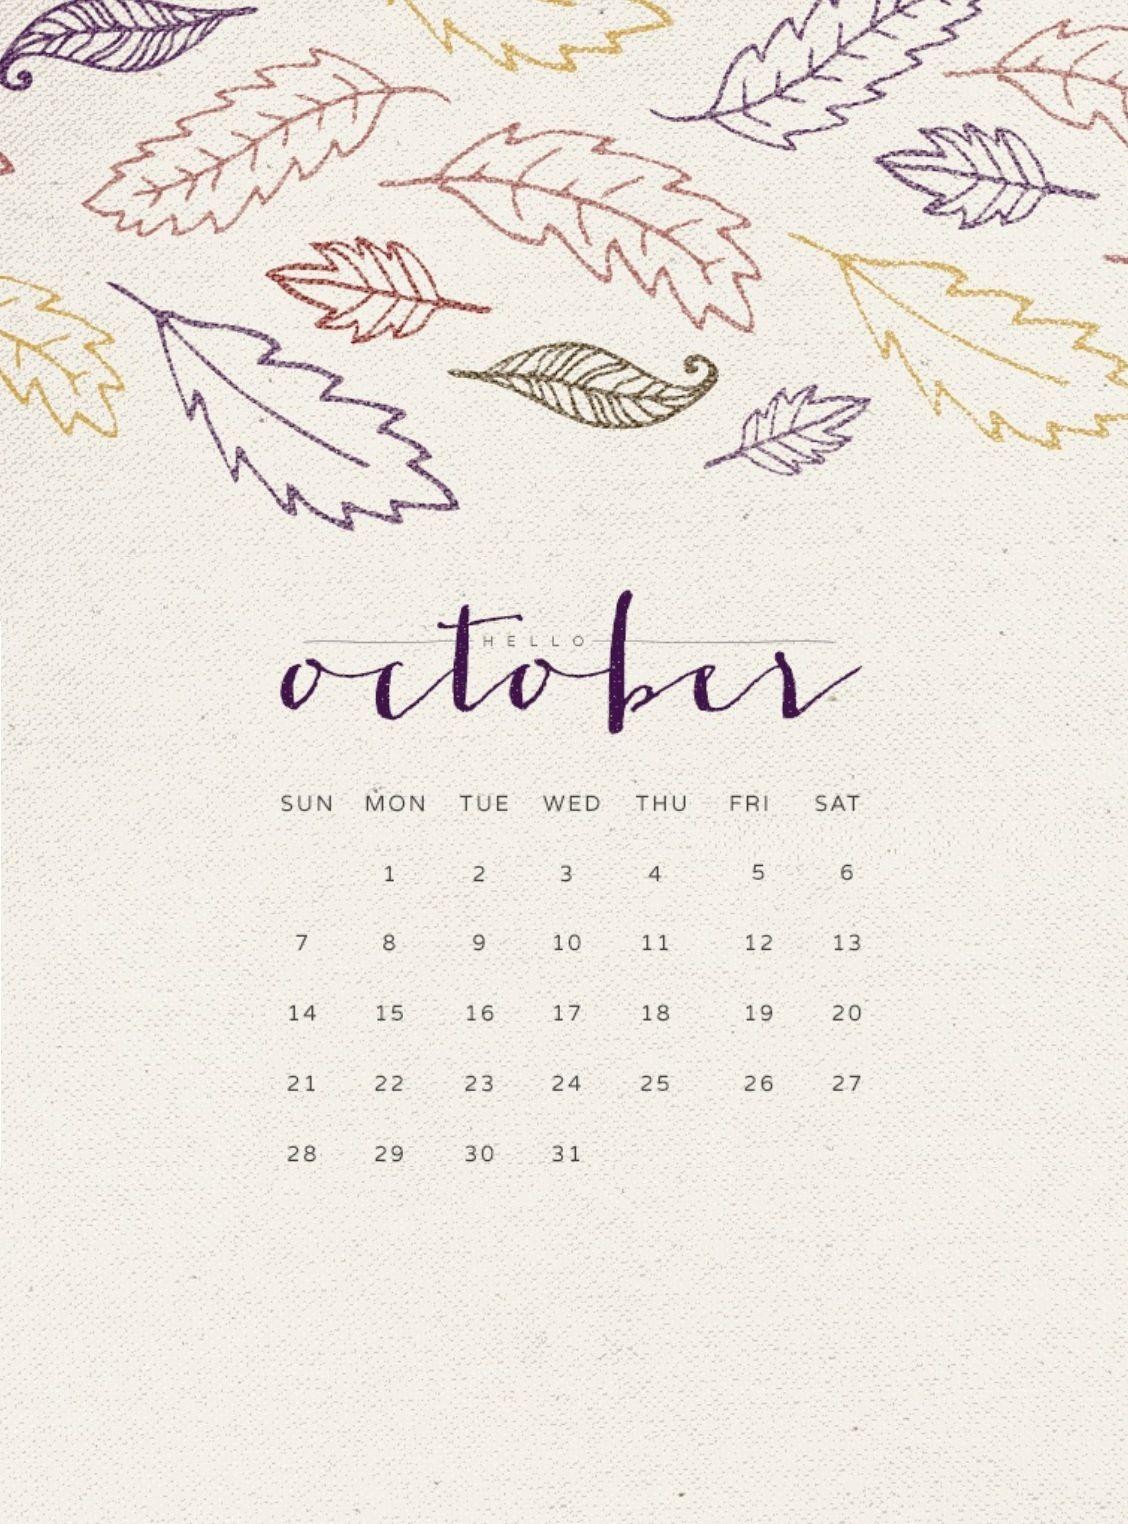 Hello October 2018 Calendar Wallpapers